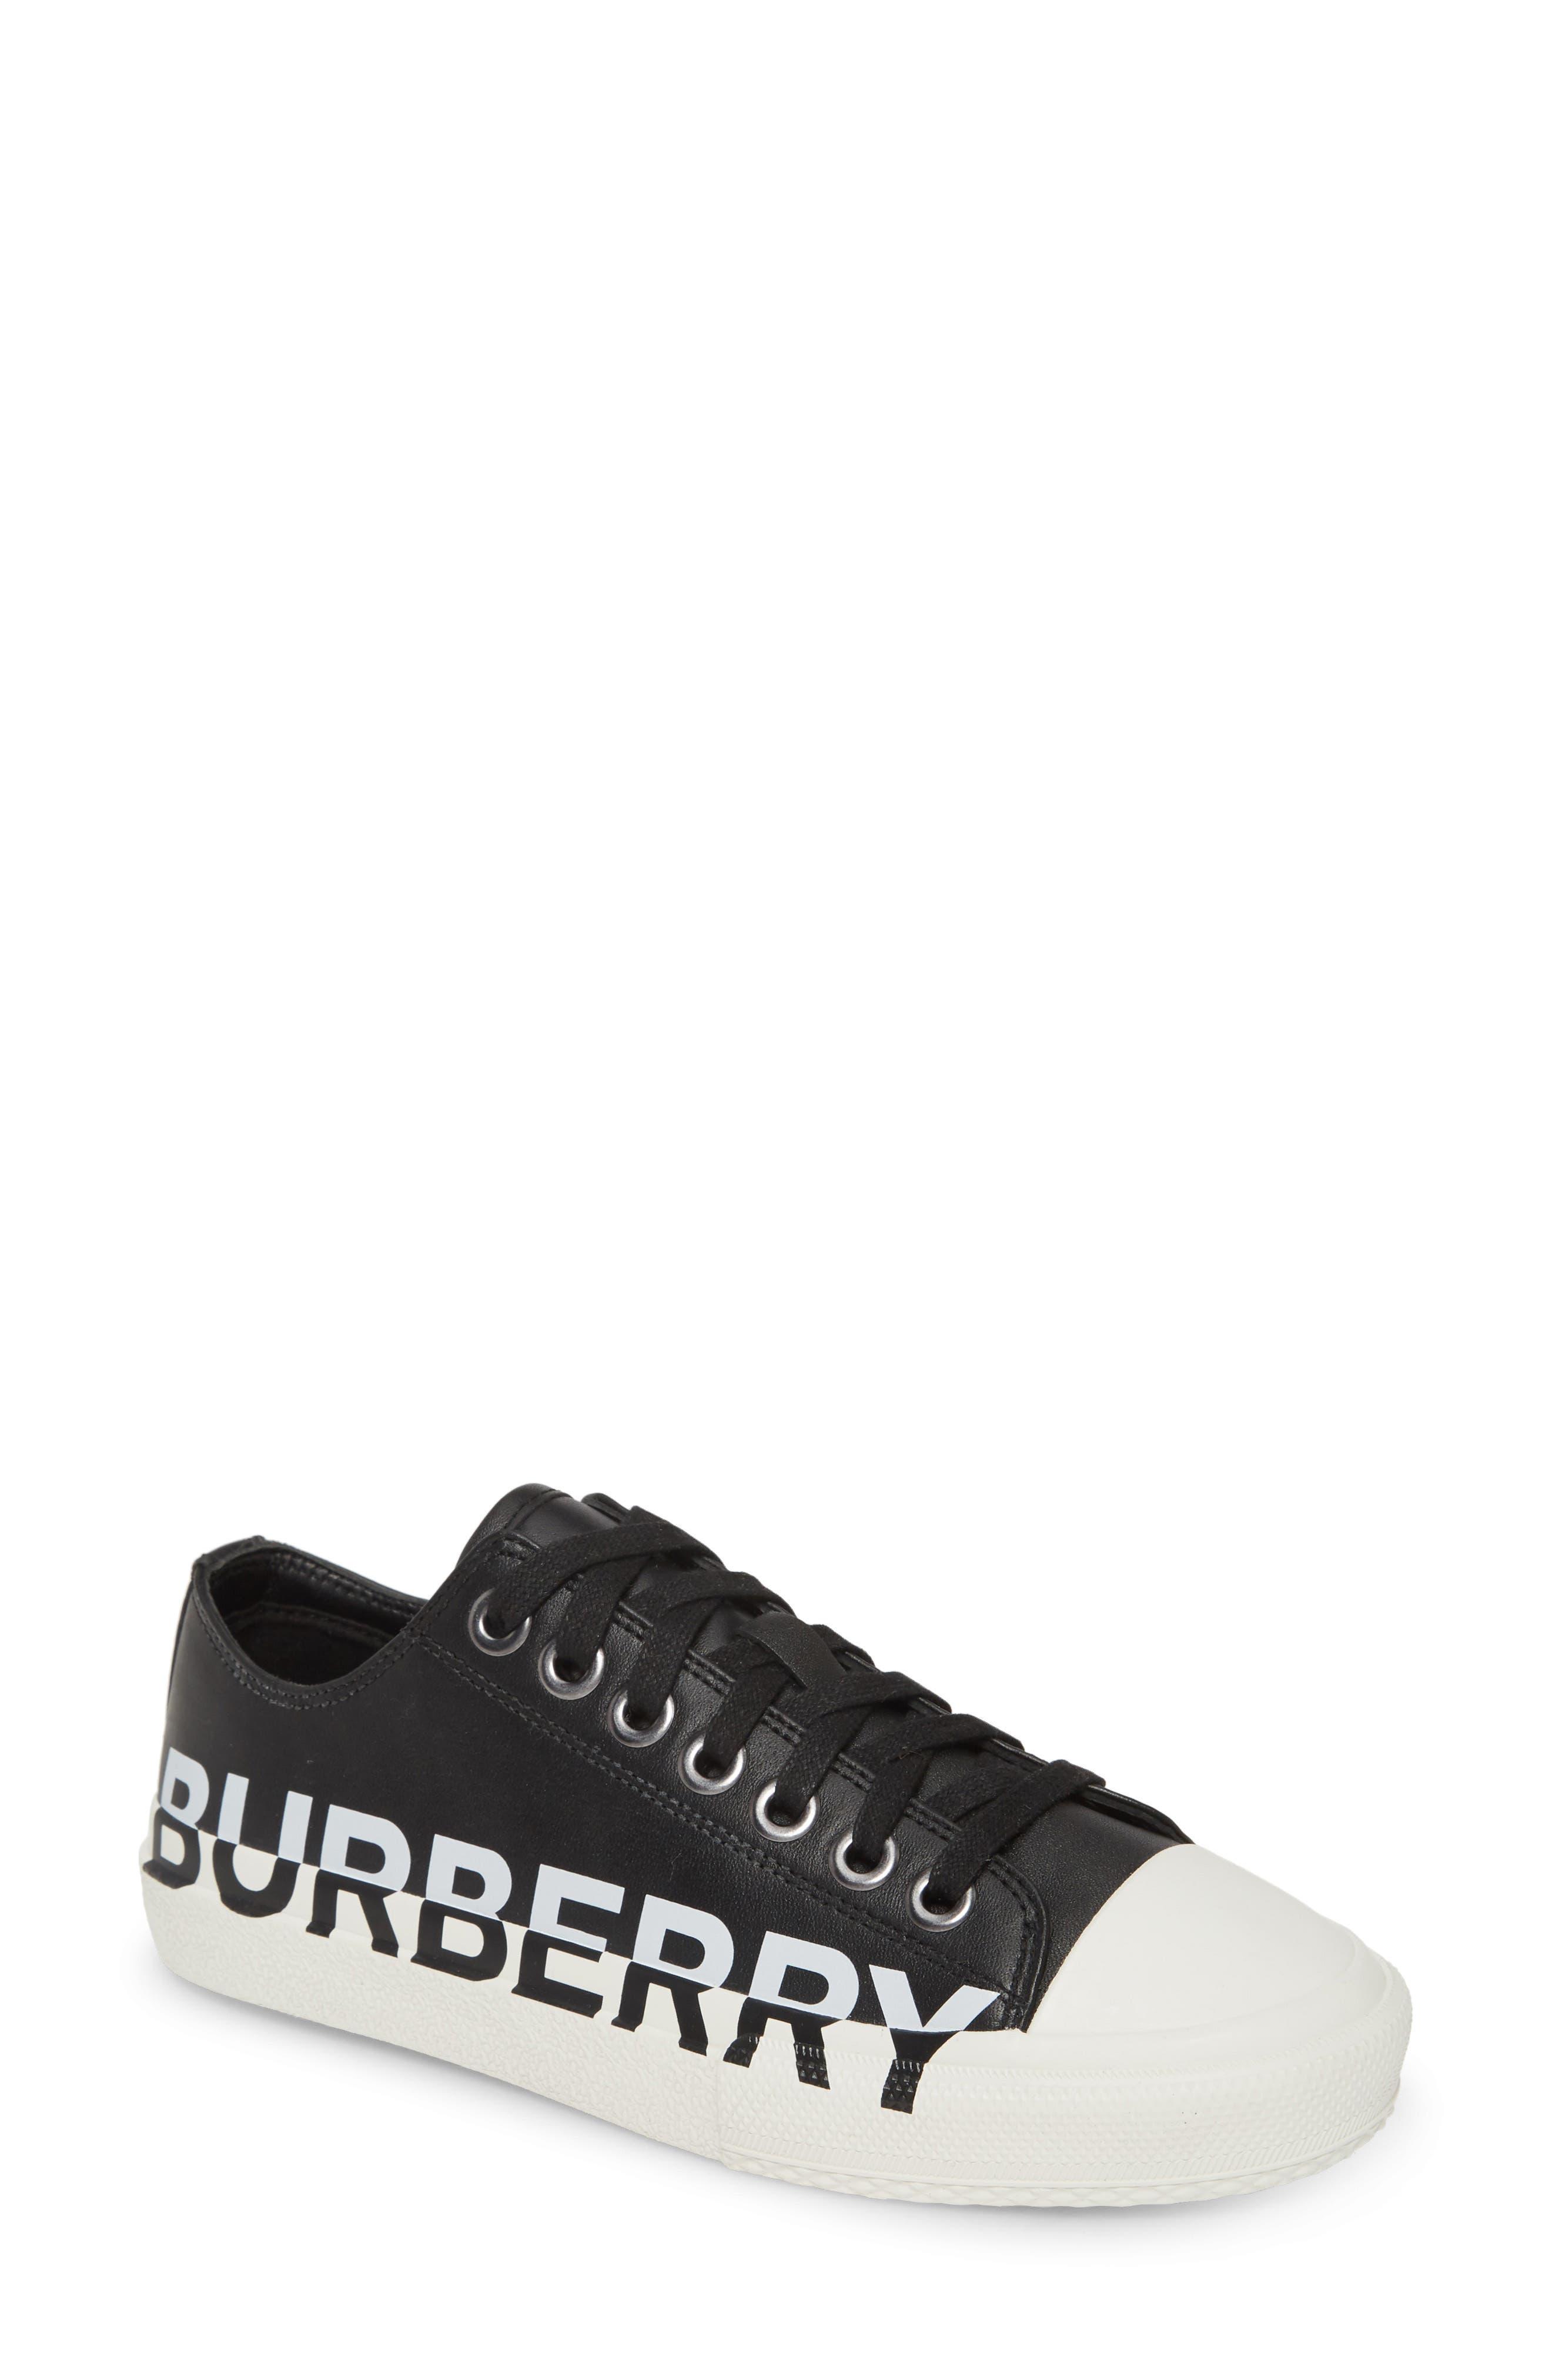 Burberry Larkhall Logo Low Top Sneaker